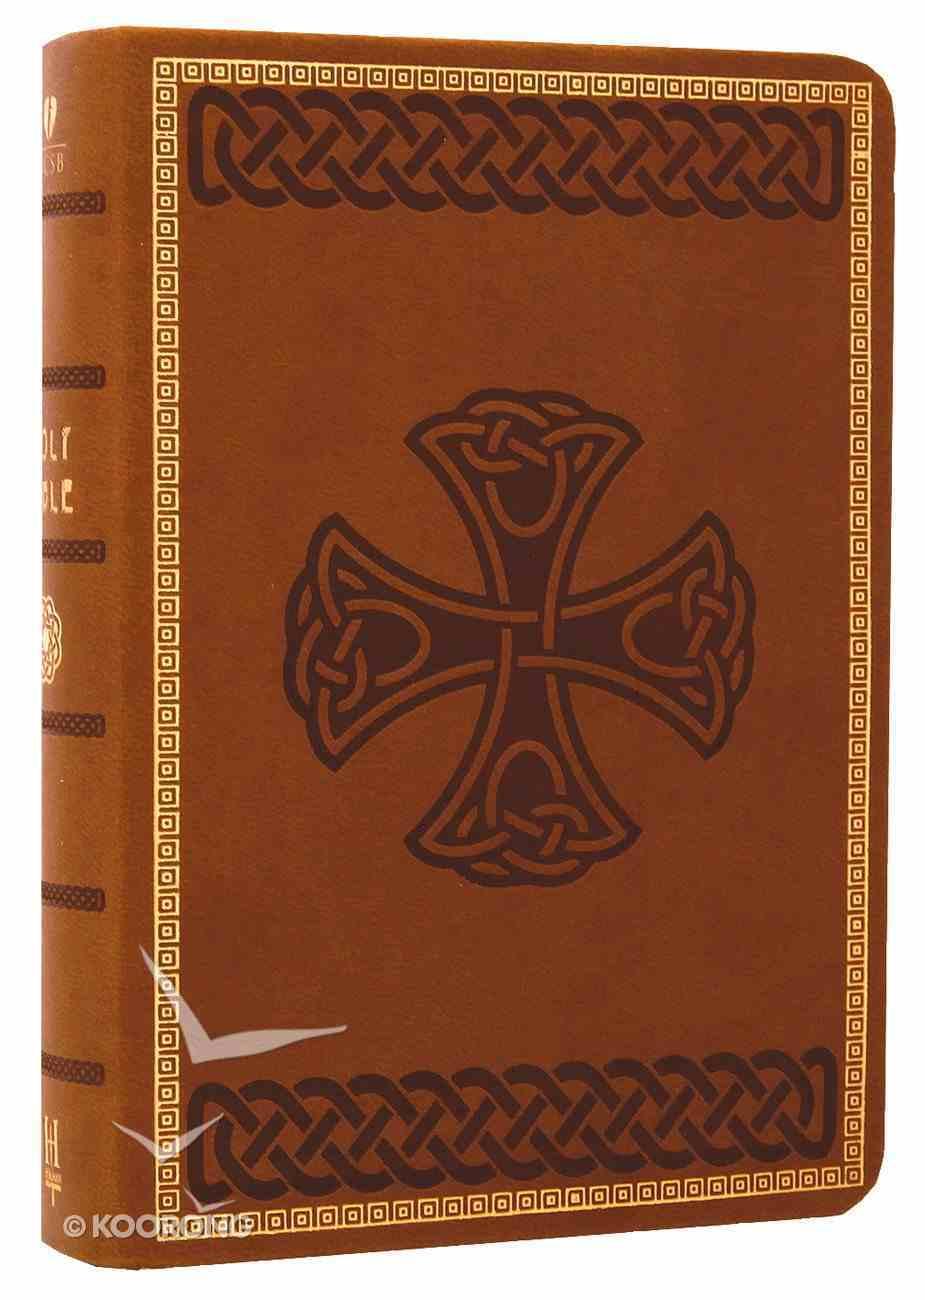 HCSB Compact Large Print Tan Celtic Design Imitation Leather